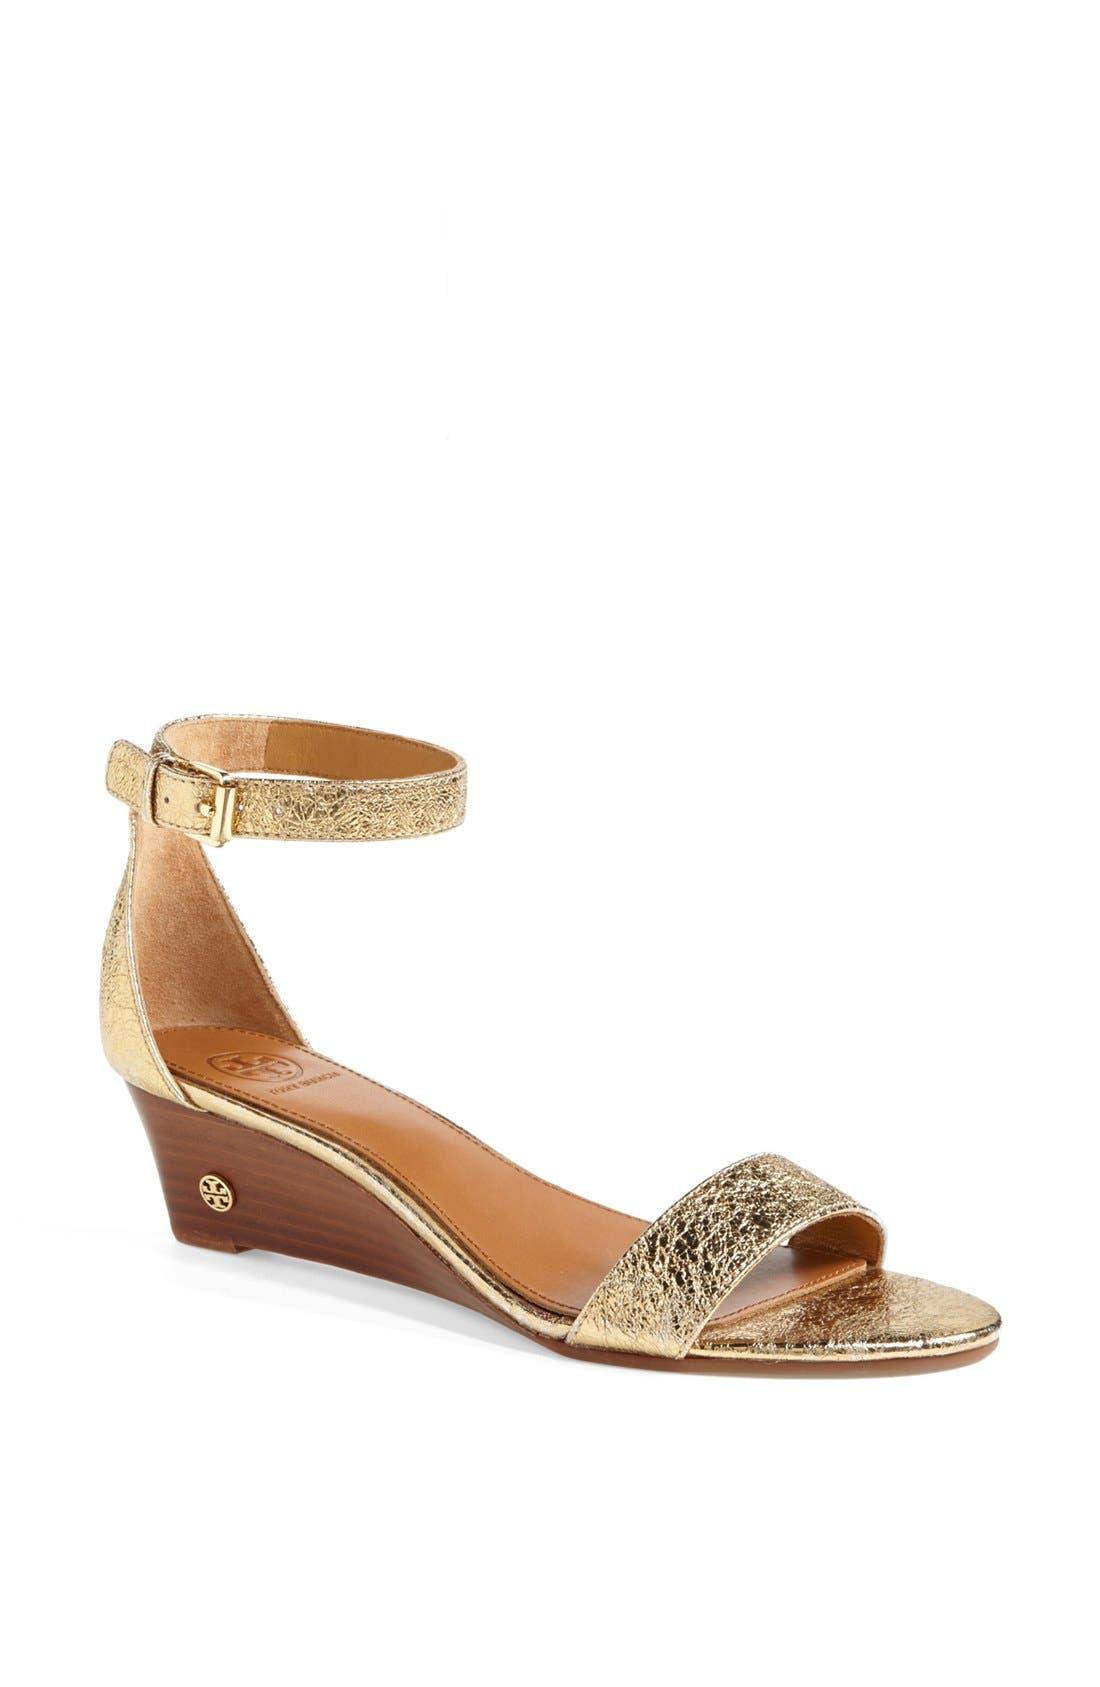 'Savannah' Wedge Sandal,                         Main,                         color, 710